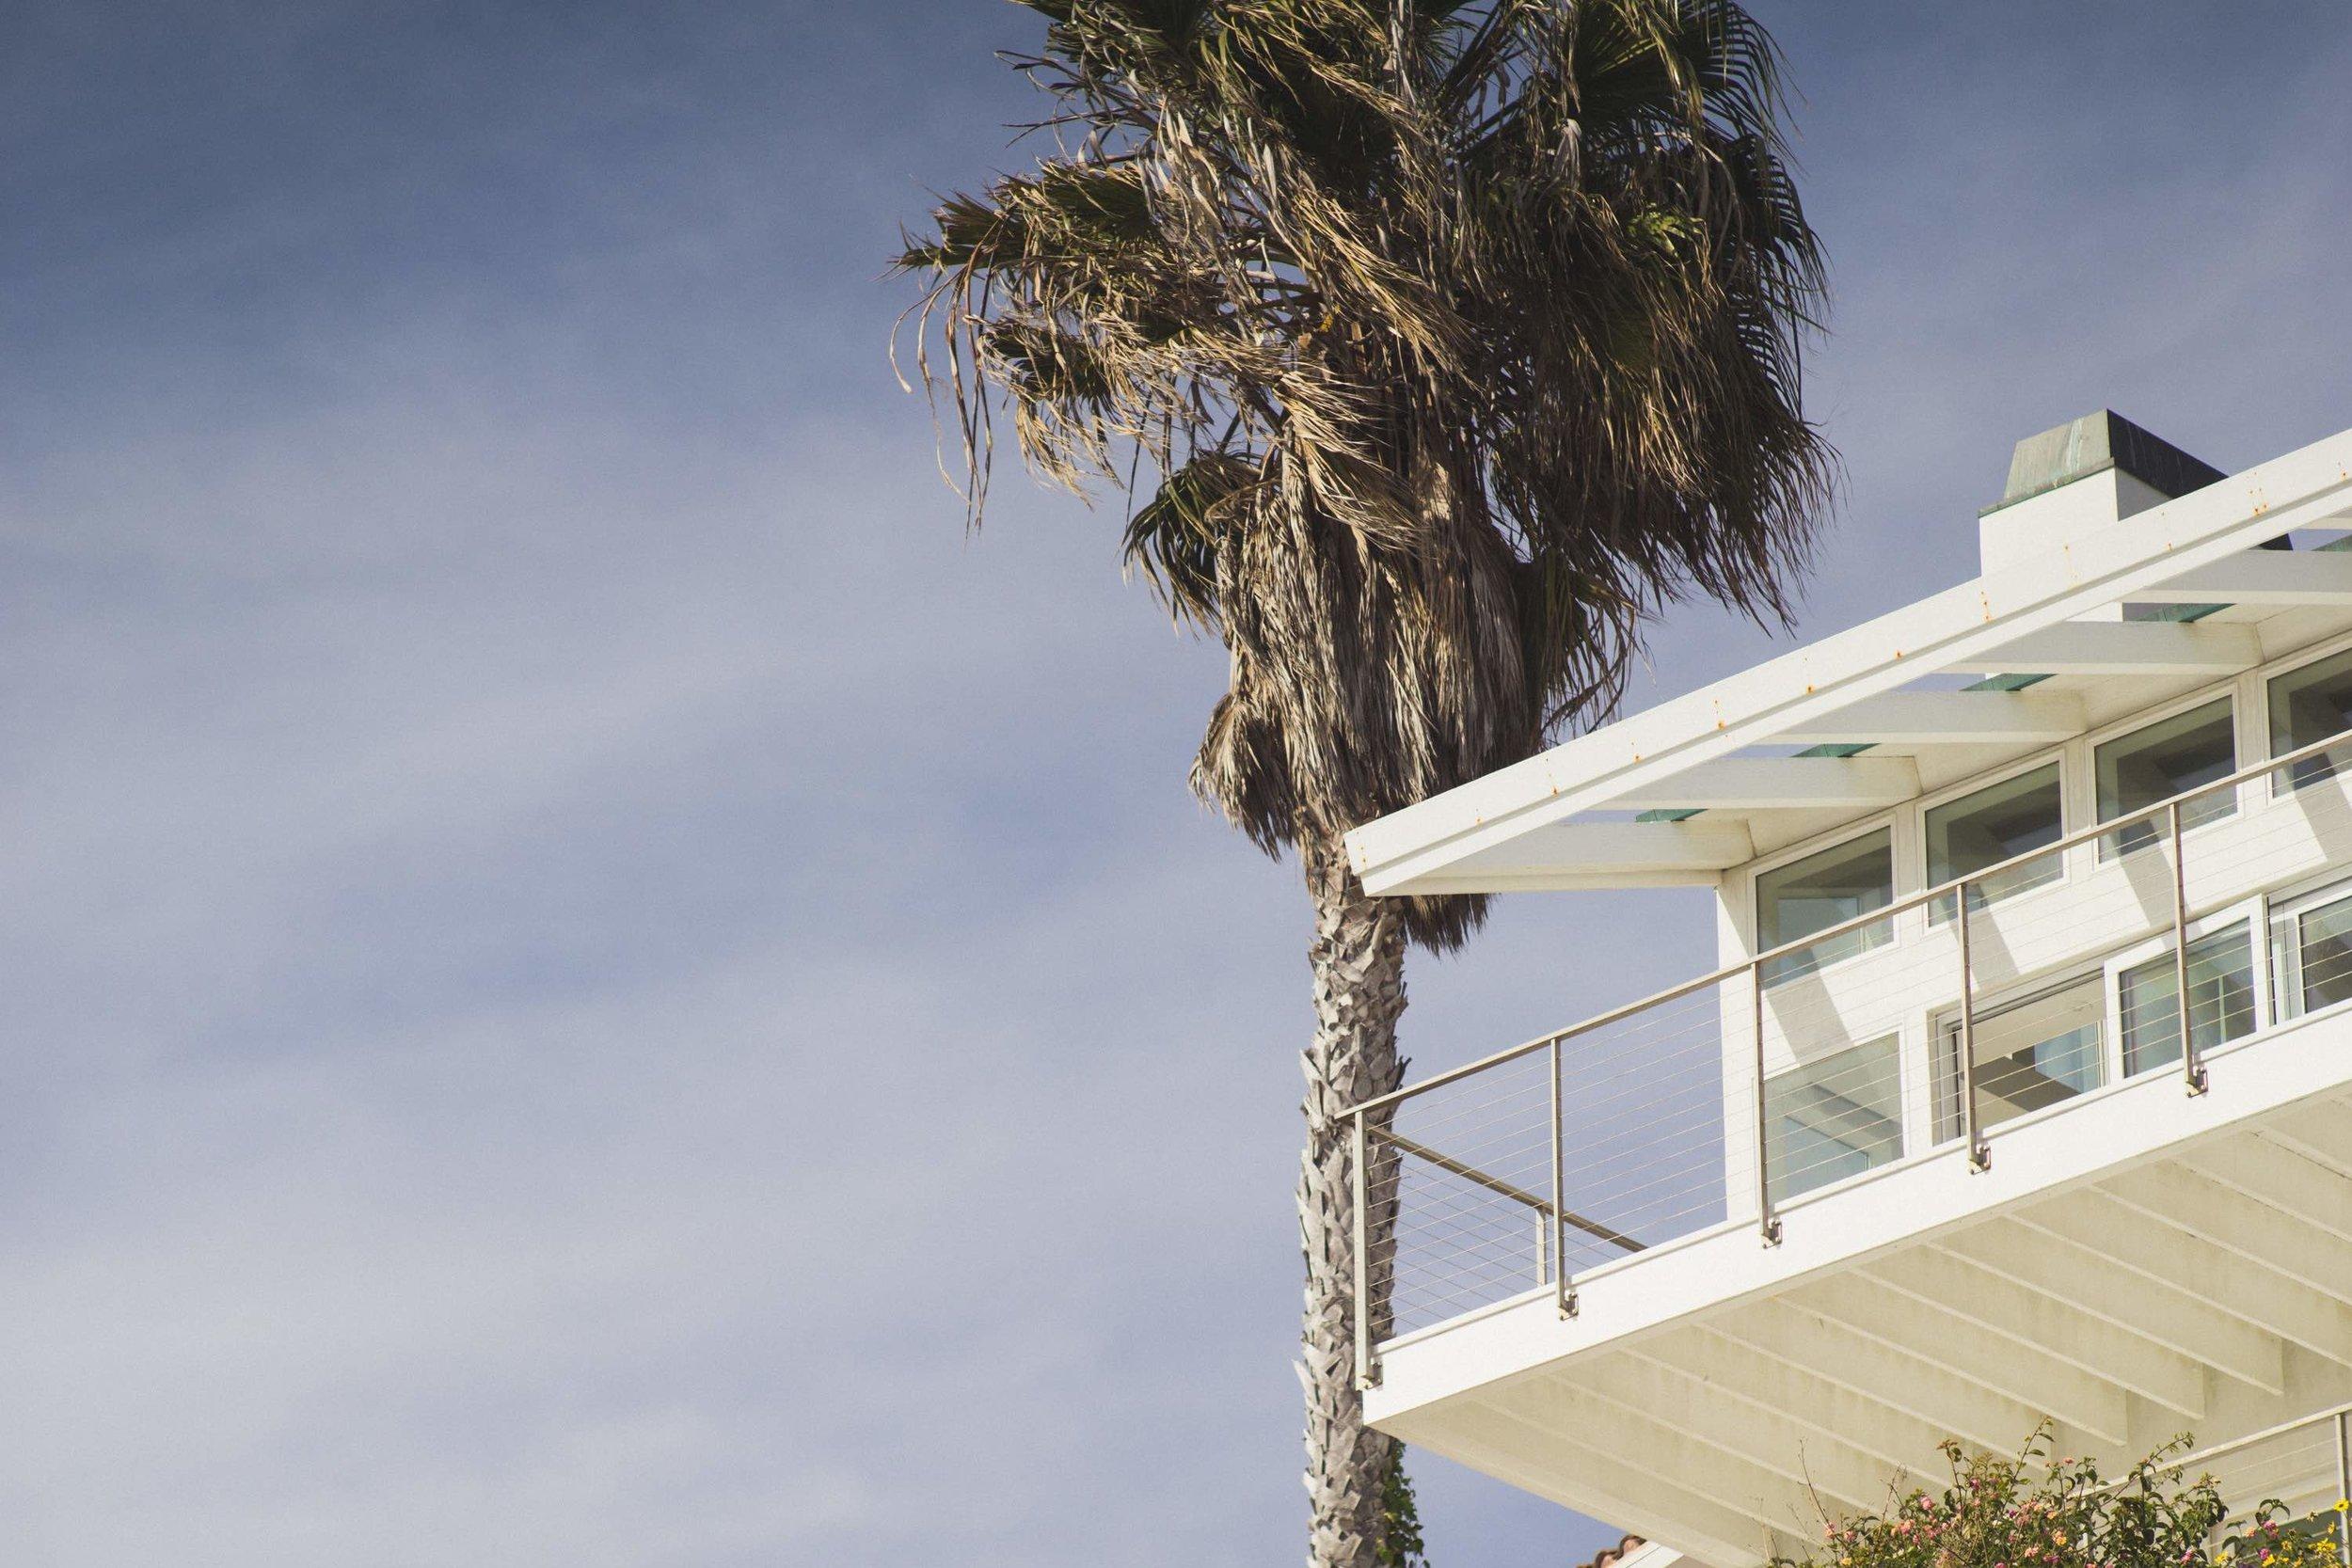 beach_house.jpg